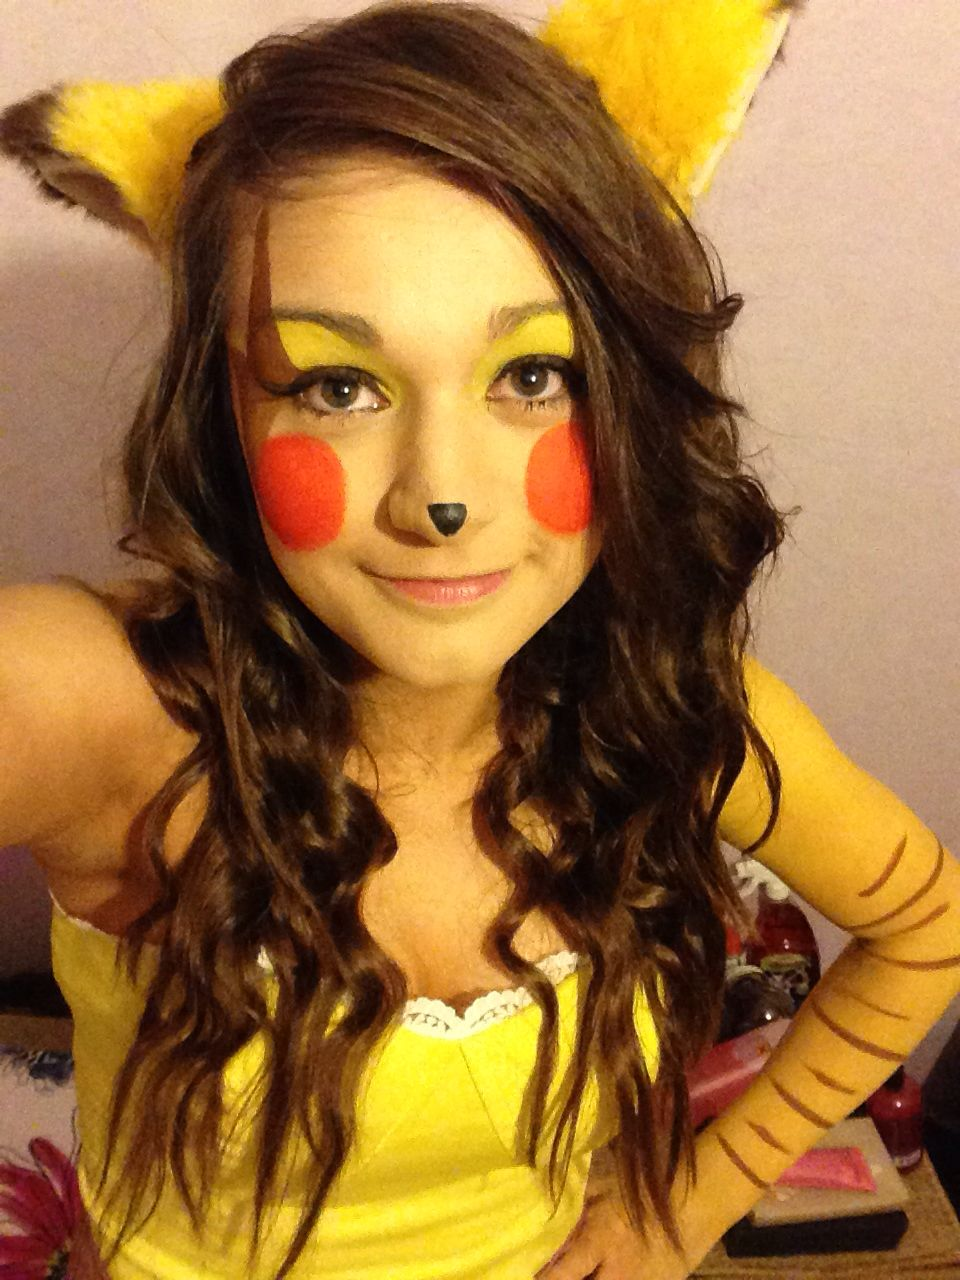 halloween pikachu pokemon makeup kost me pinterest pikachu kost m fasching und kost m. Black Bedroom Furniture Sets. Home Design Ideas